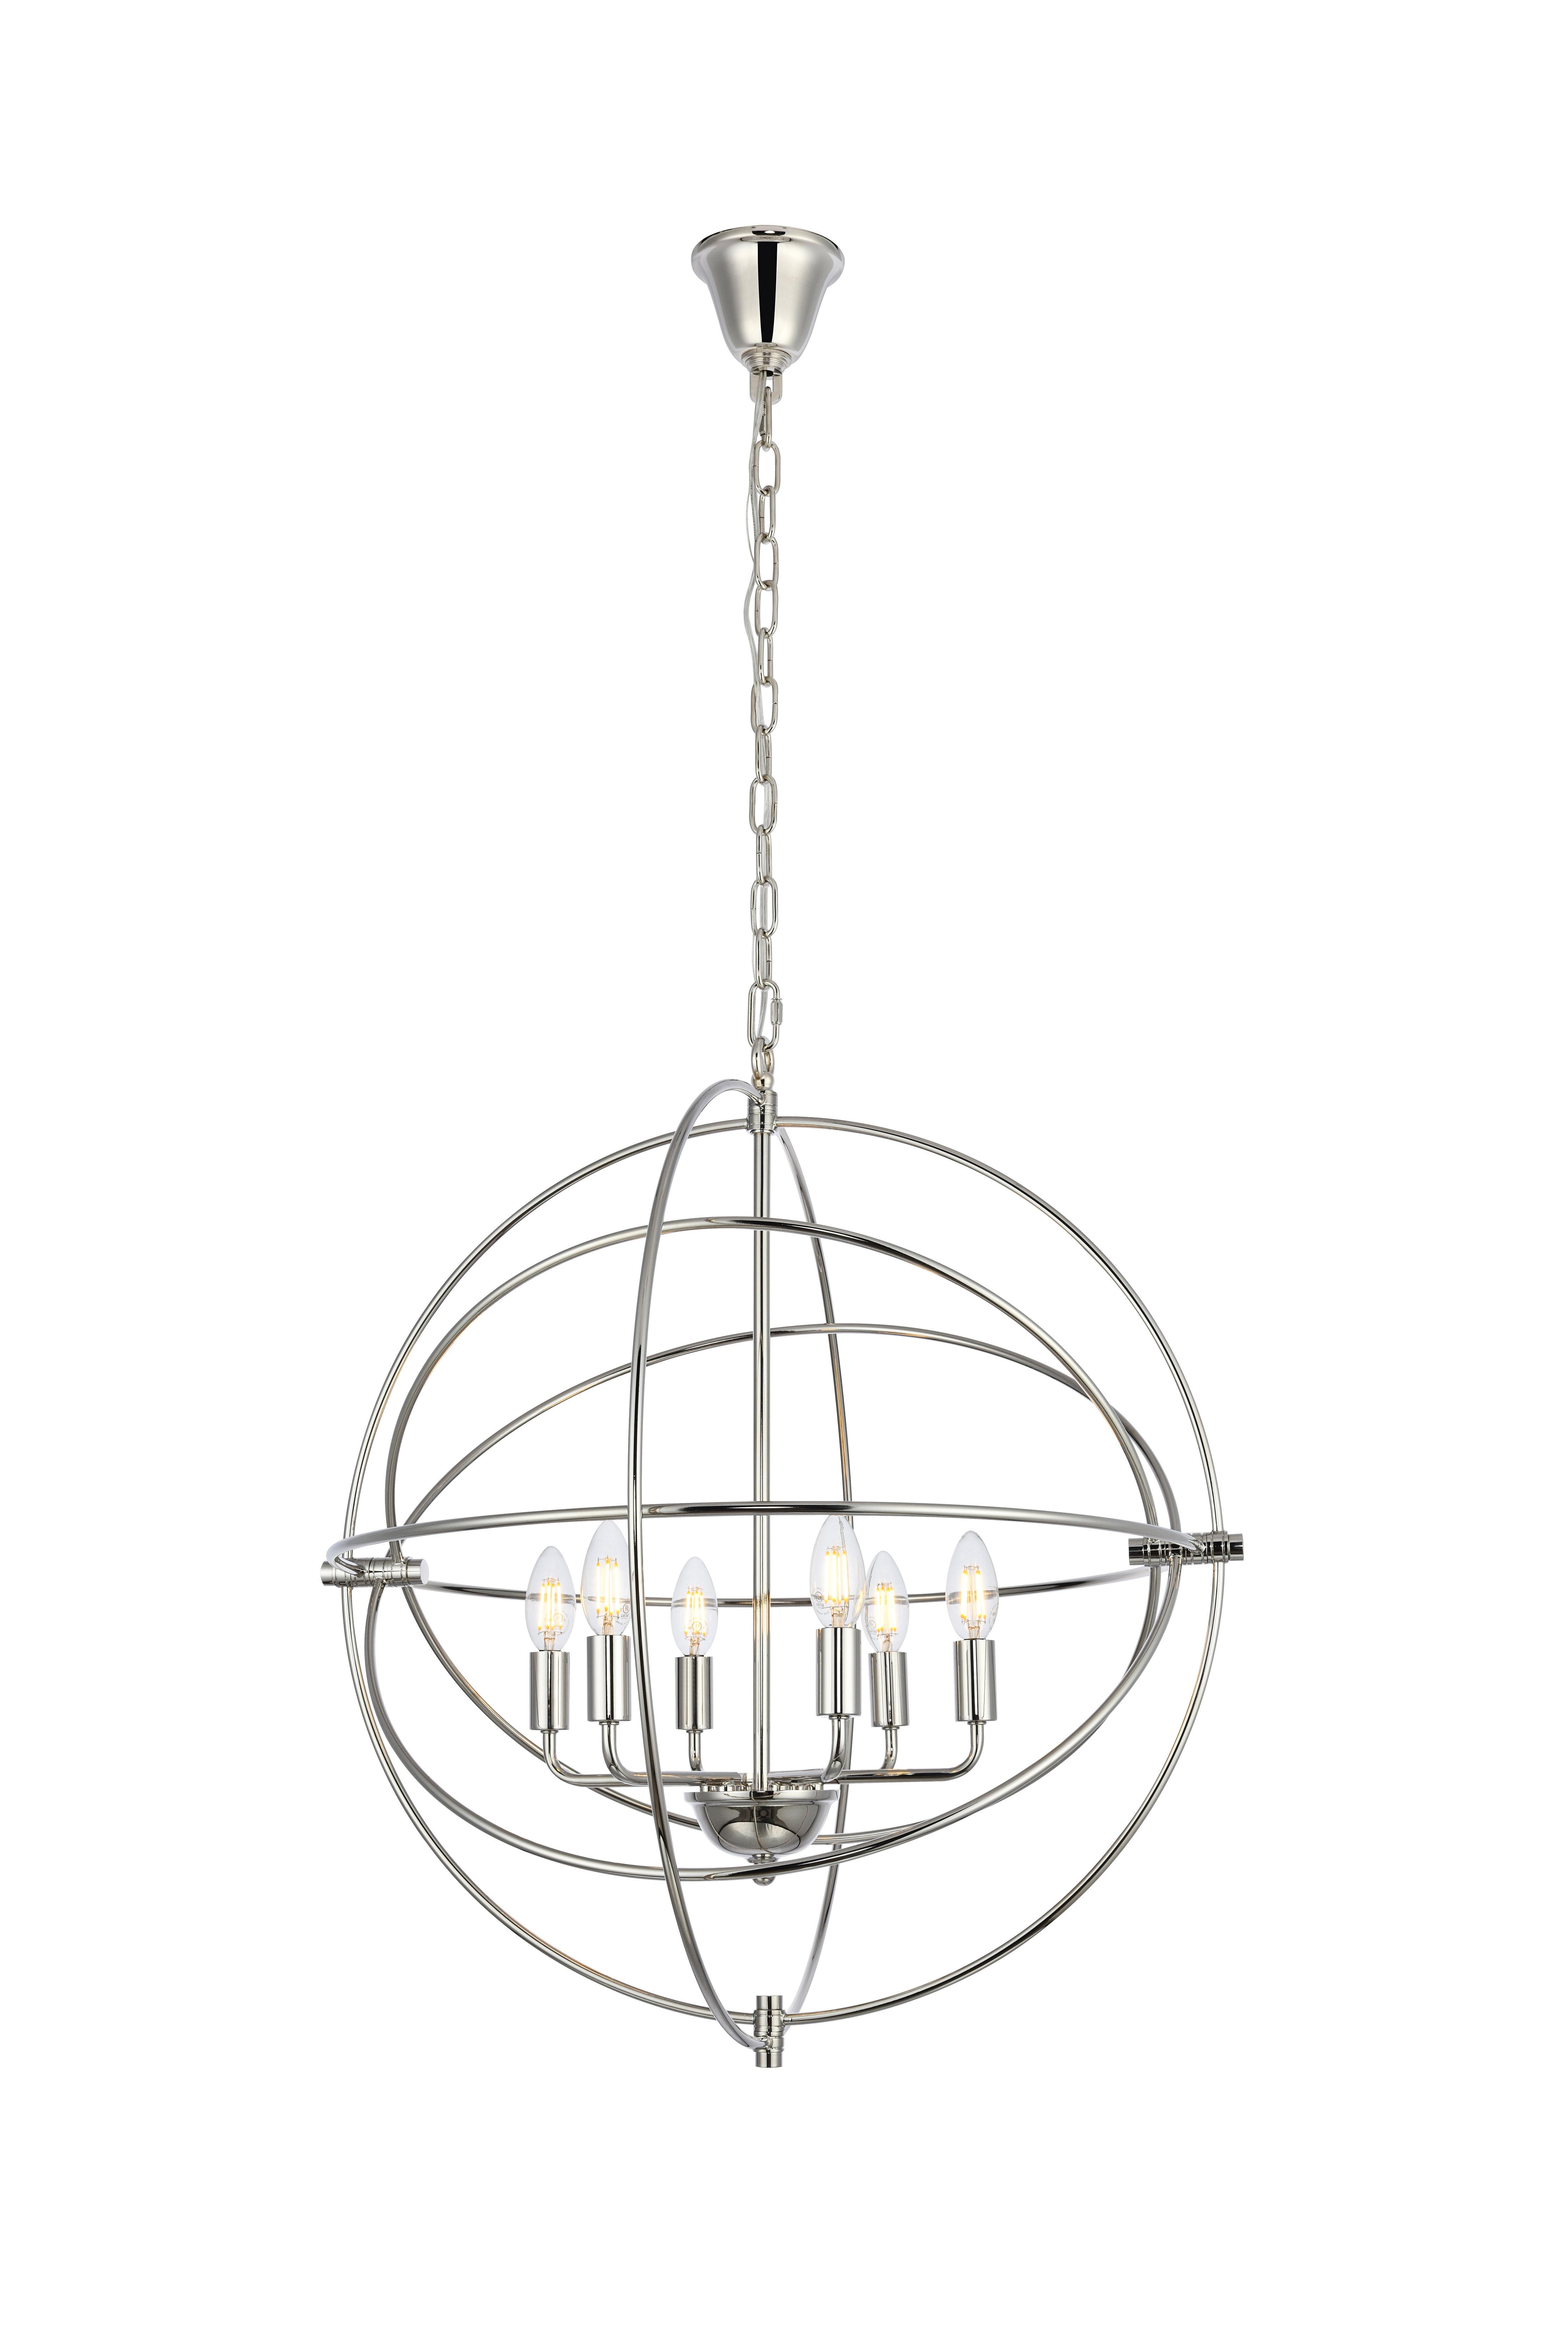 Hamby 6 Light Globe Chandelier With Recent Gregoire 6 Light Globe Chandeliers (Gallery 13 of 20)